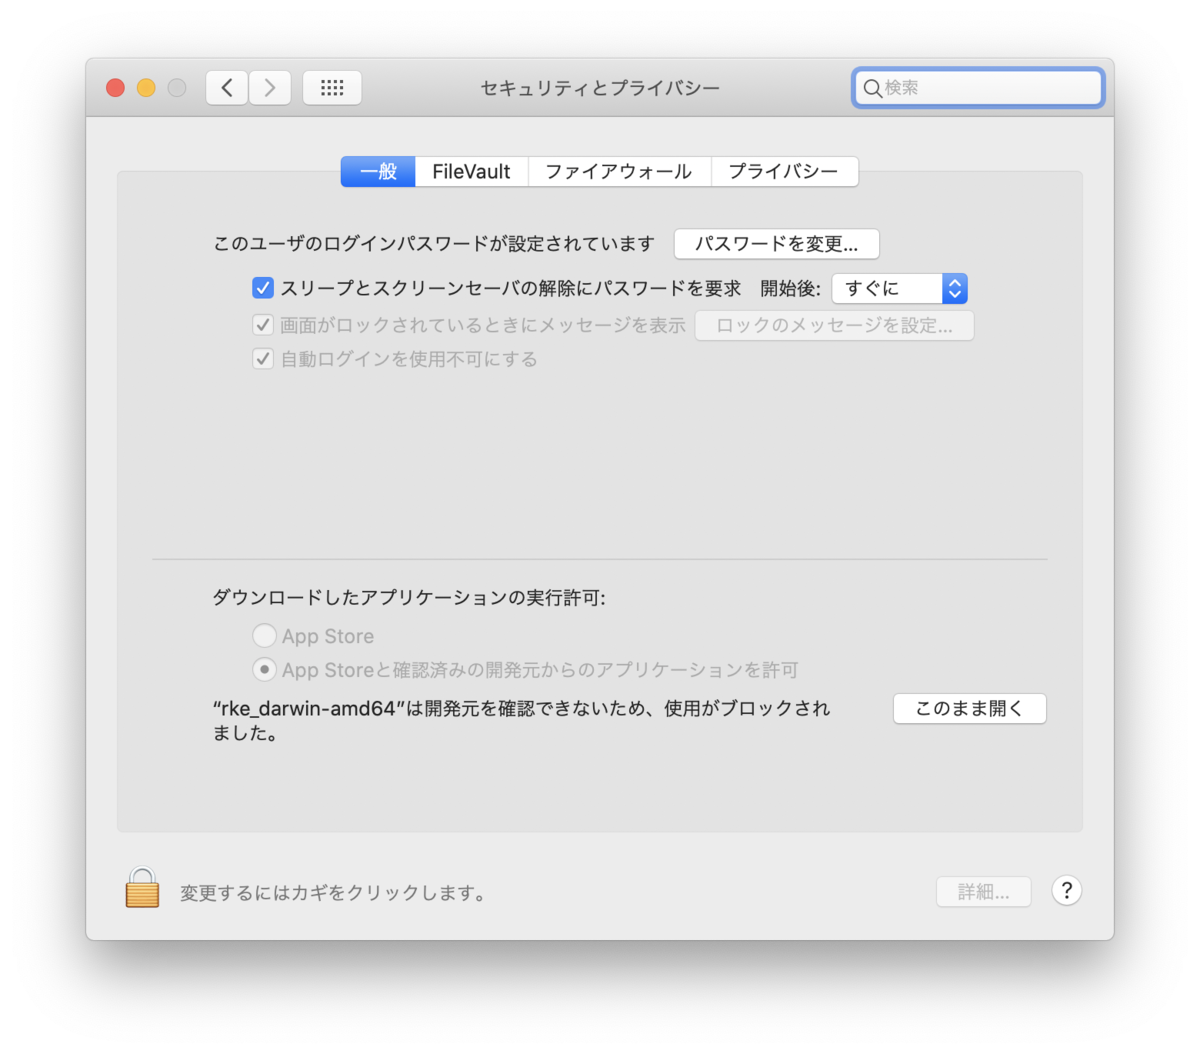 f:id:ytooyama:20200519200712p:plain